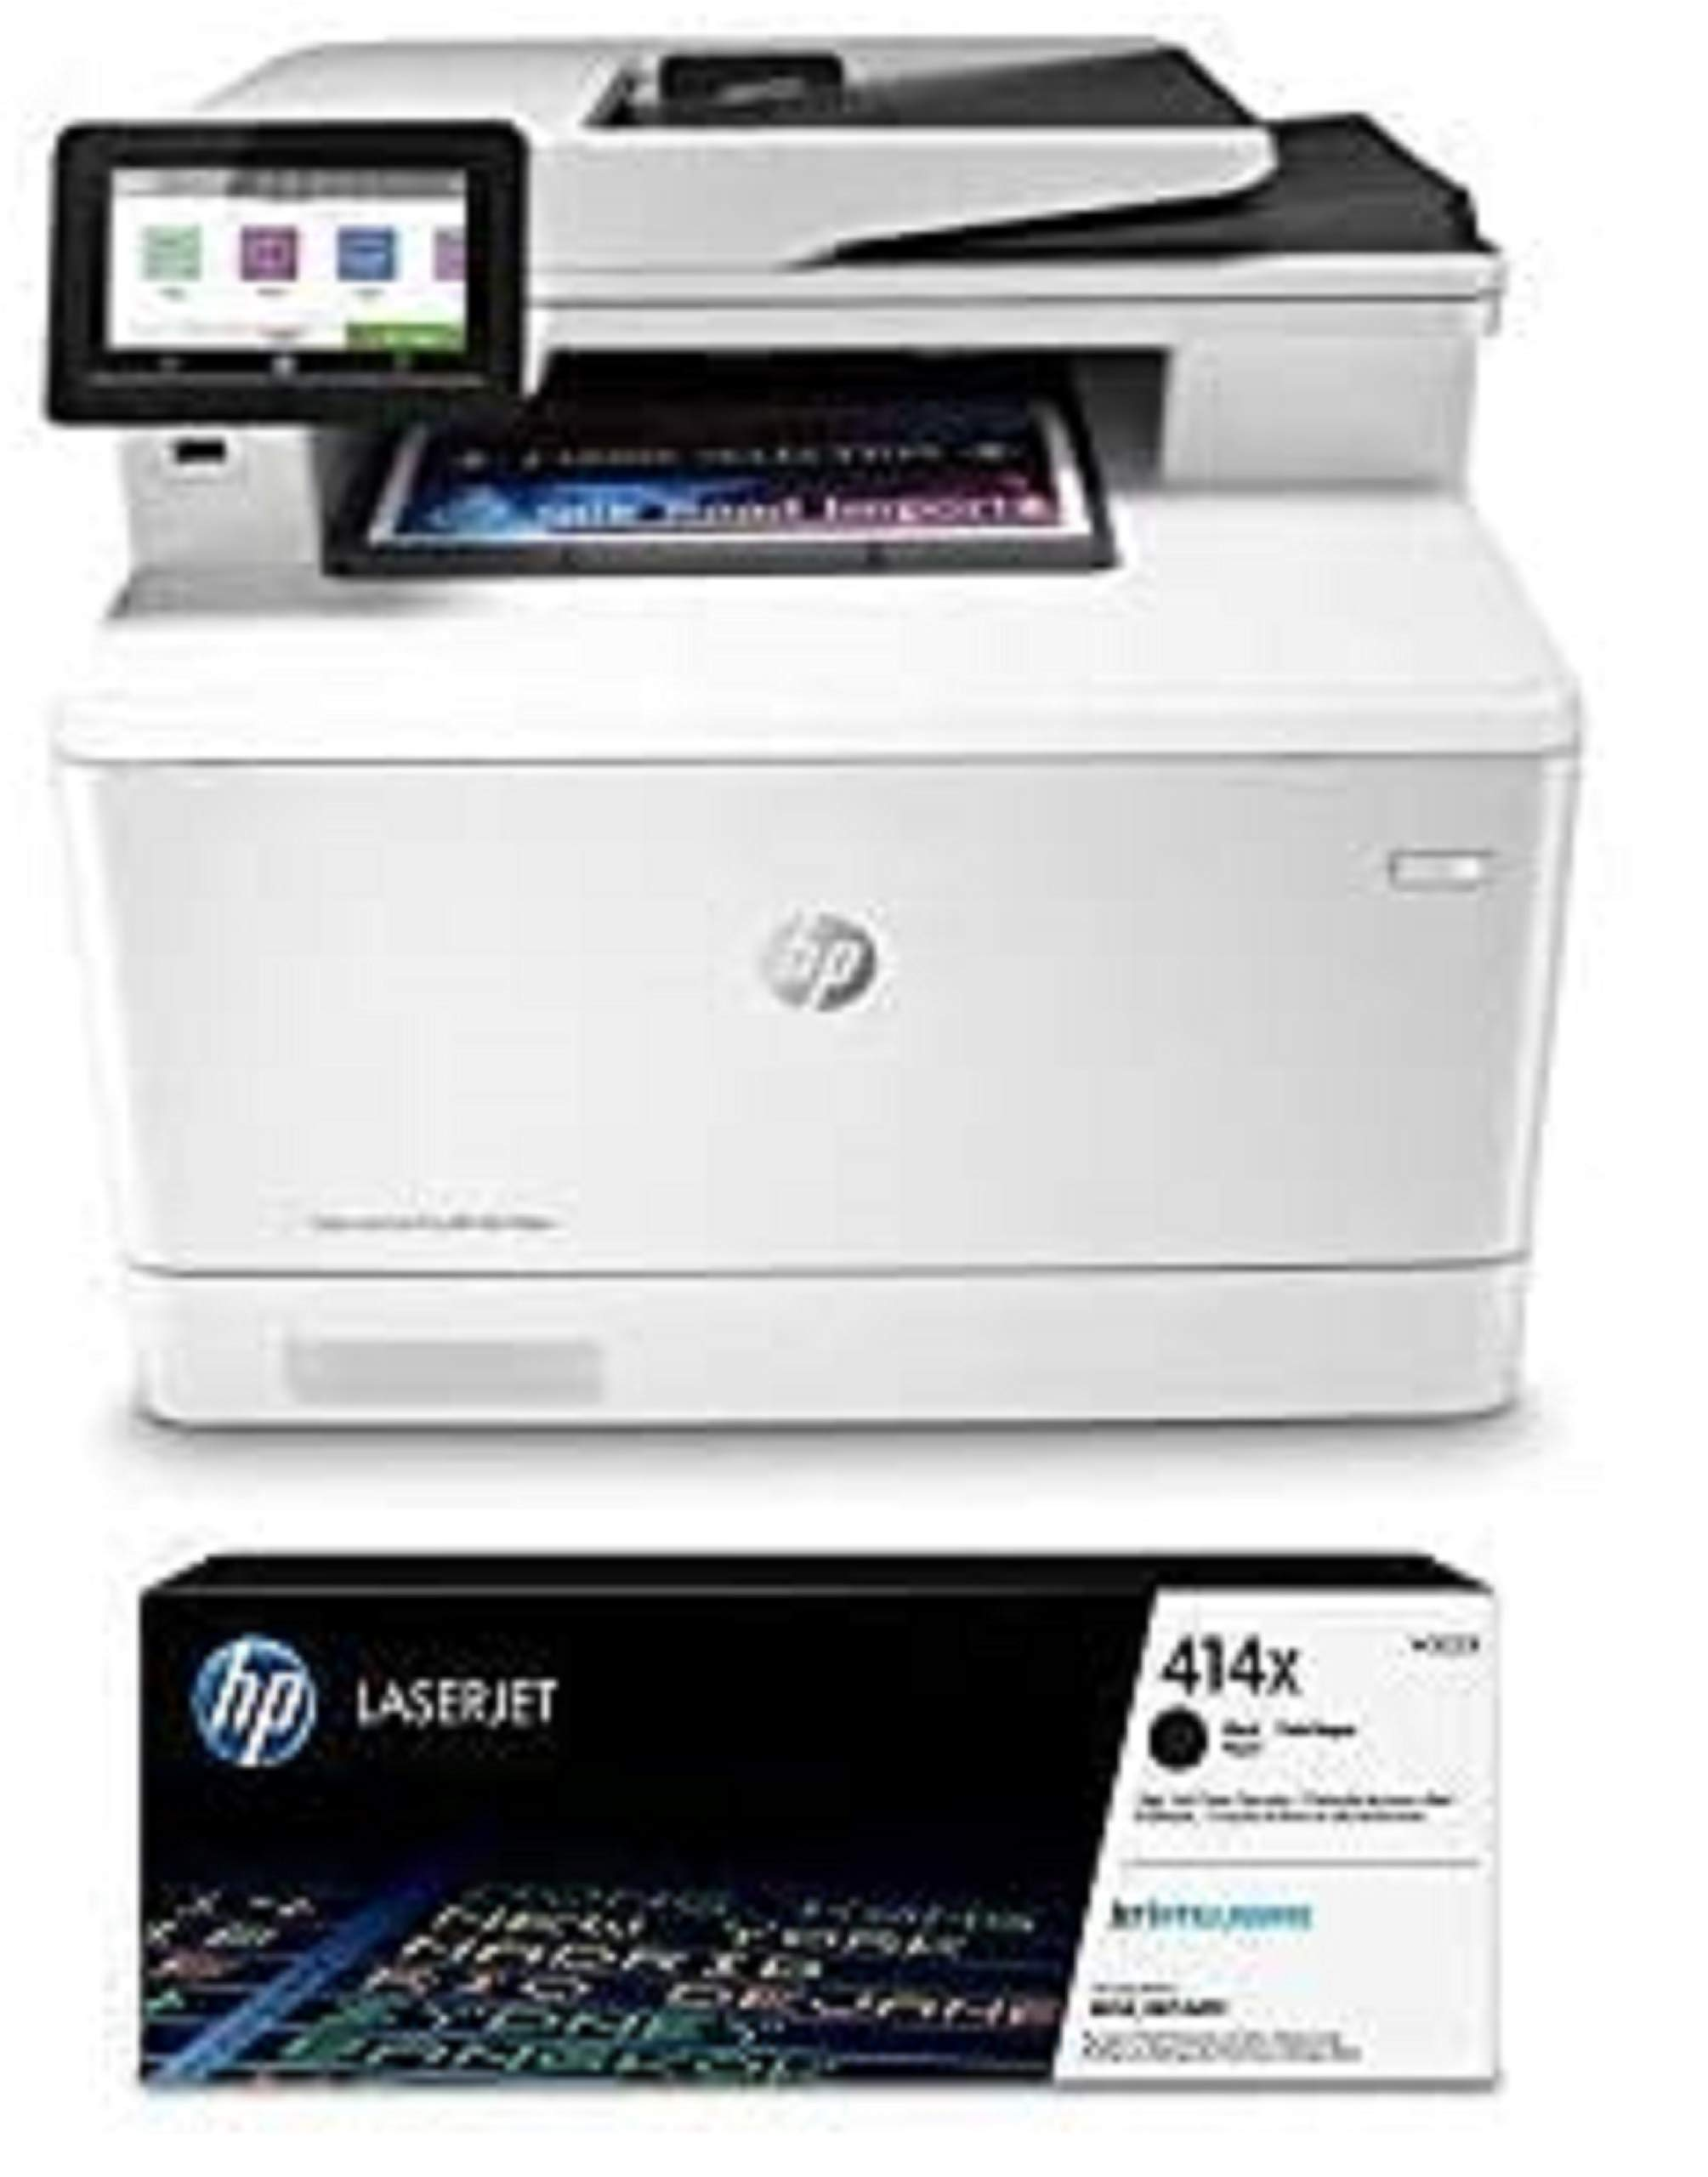 HP Color Laserjet Pro Multifunction M479fdw Wireless Laser Printer (W1A80A) with High Yield Black Toner Cartridge